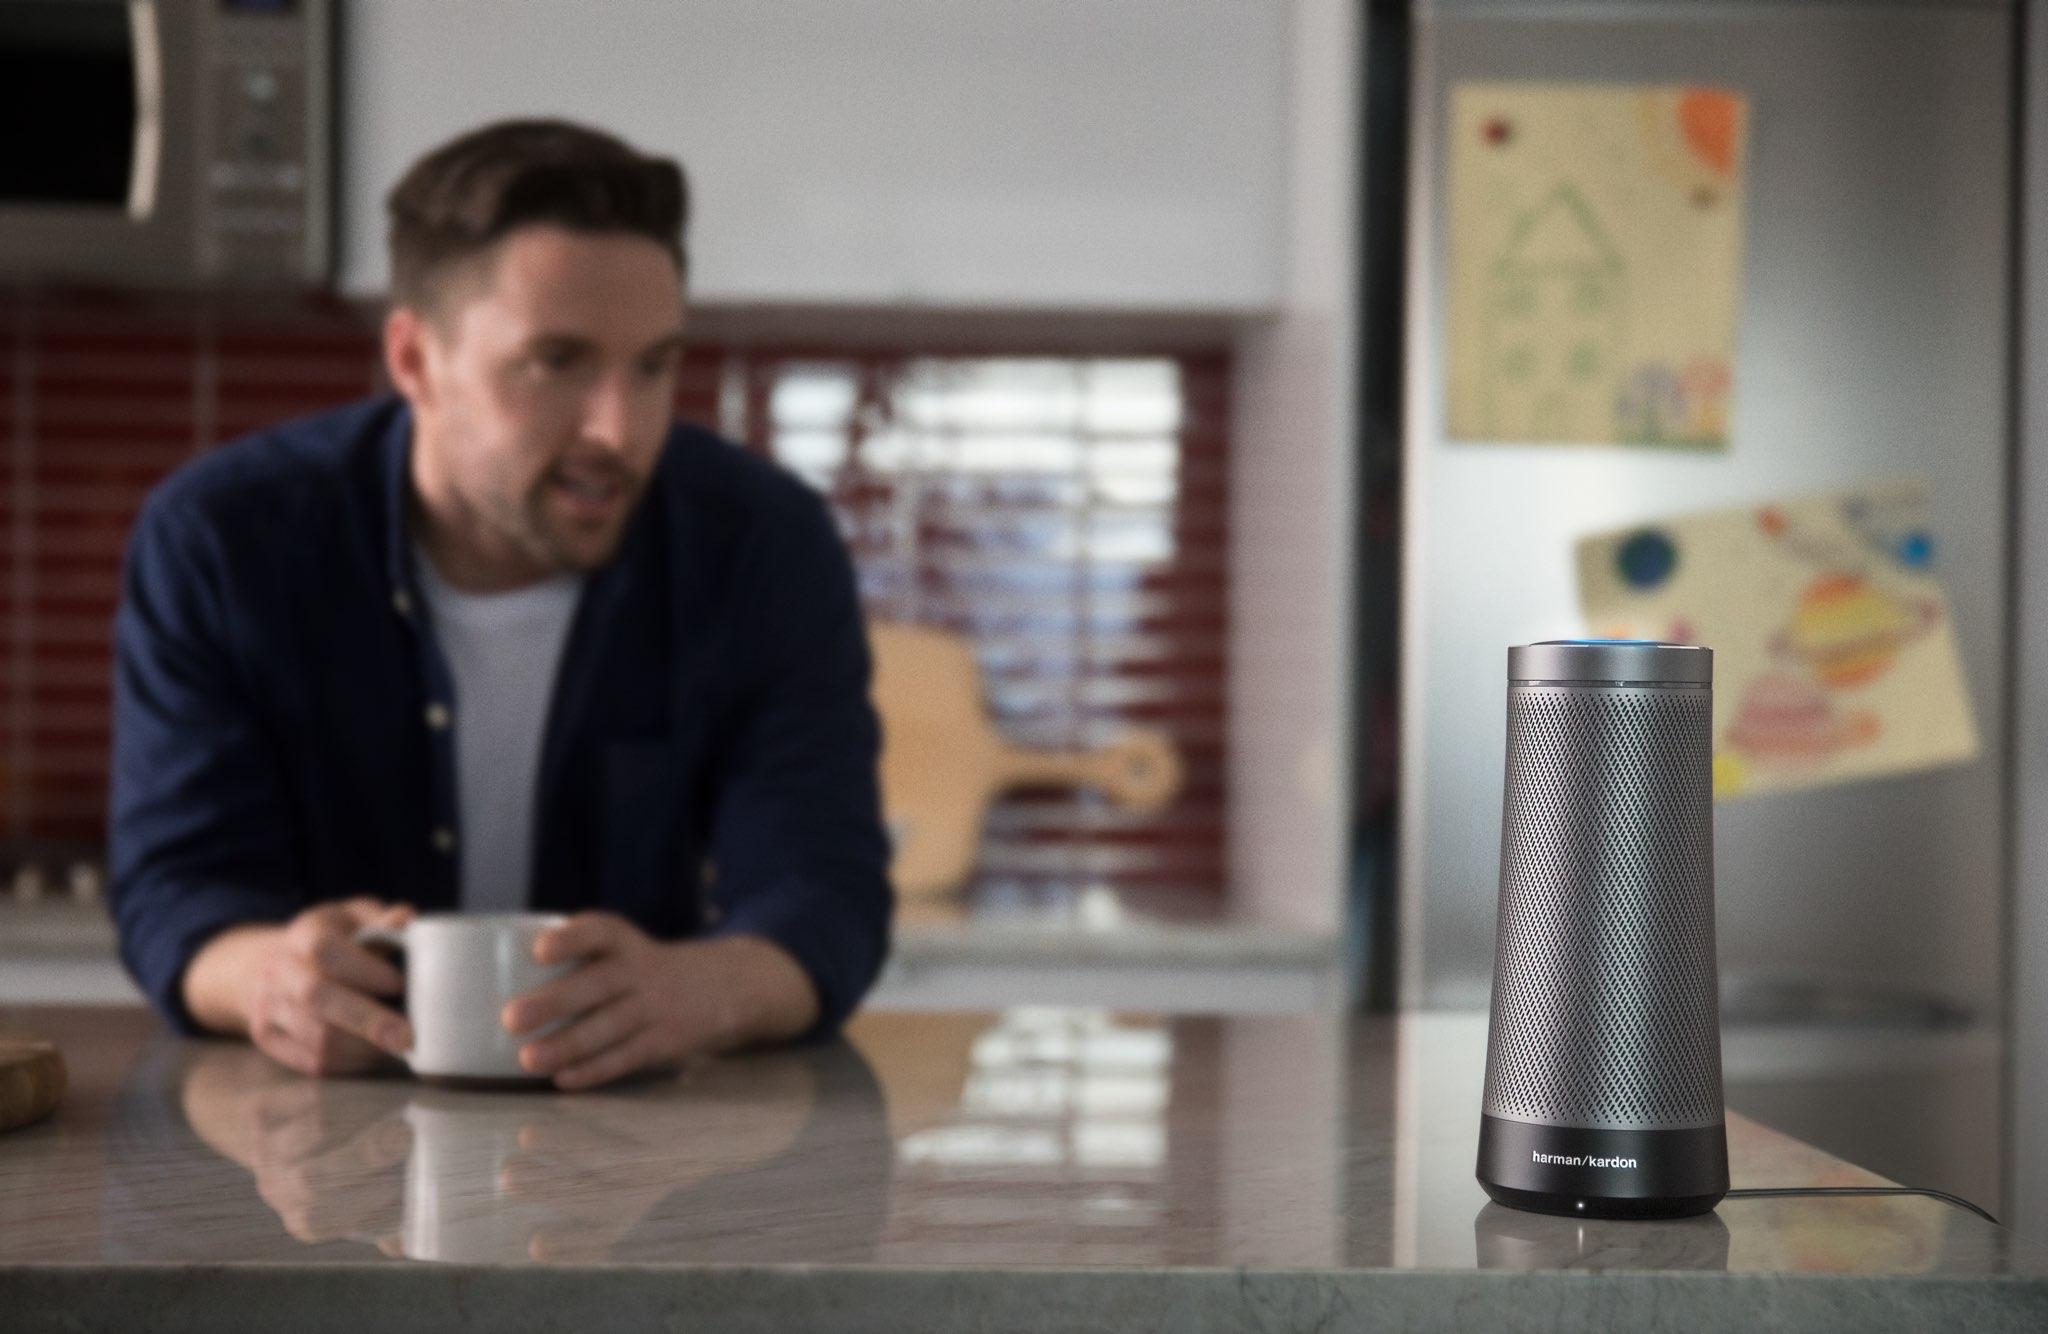 A lifestyle photograph promoting Harman Kardon's Invoke smart speaker featuring Microsoft's Cortana digital assistant